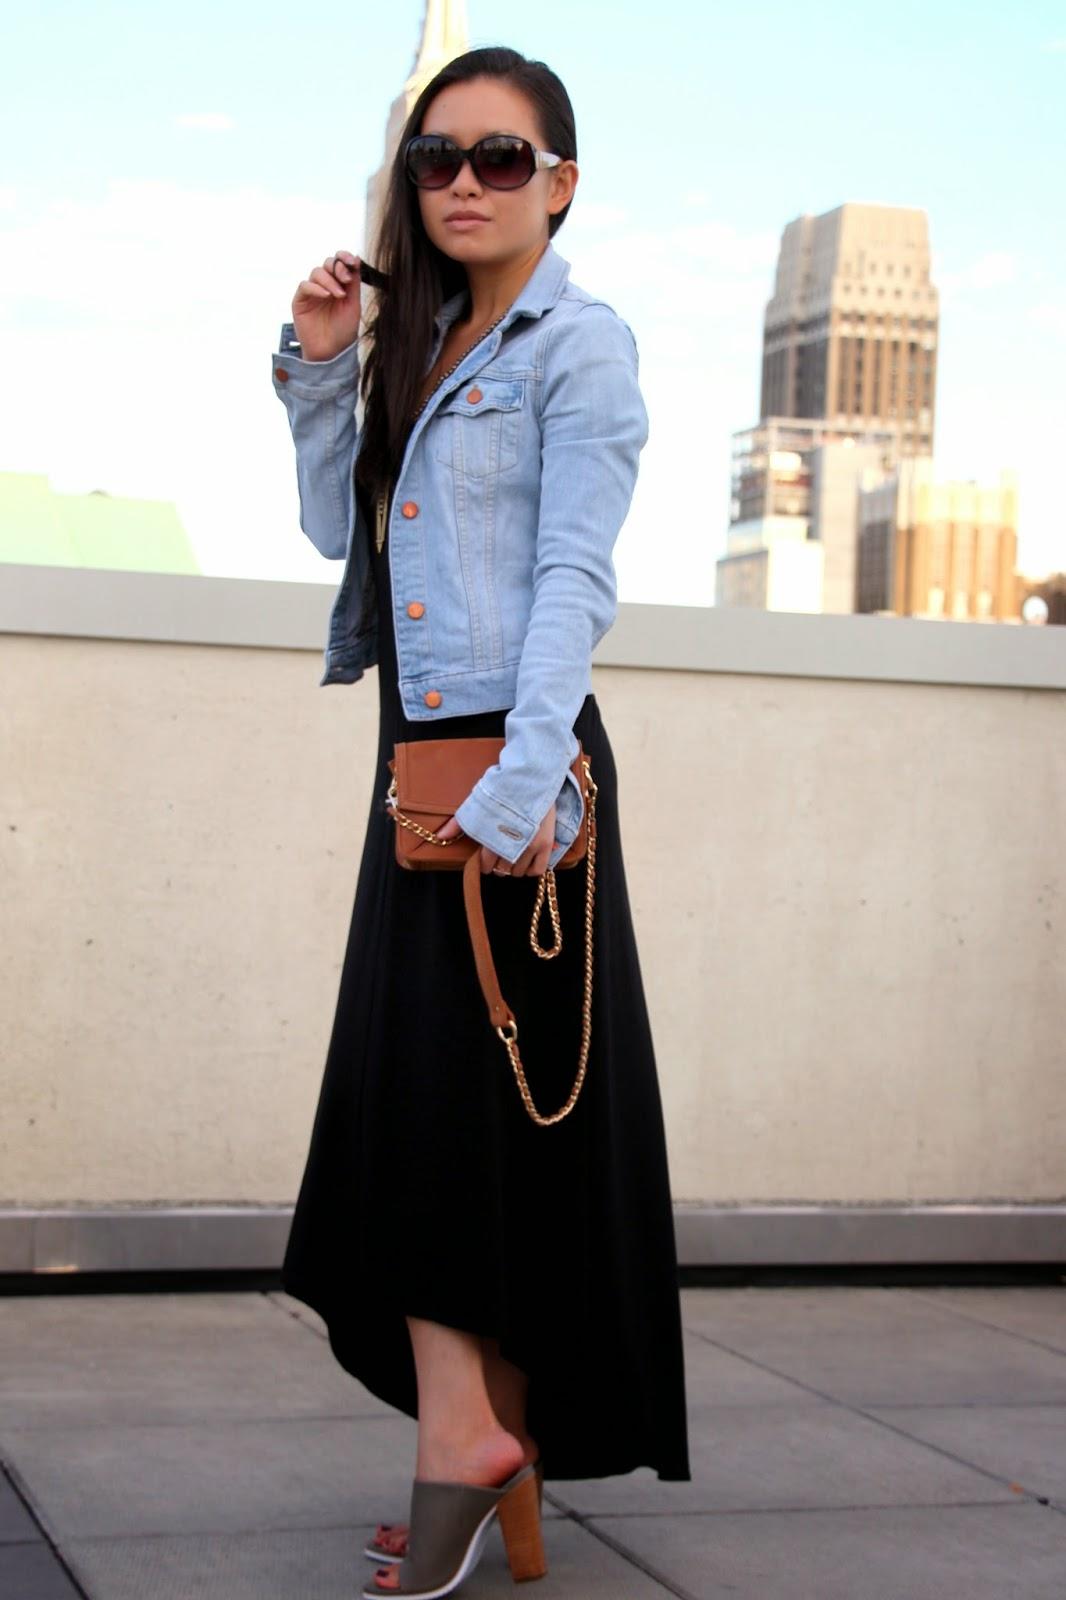 ecb44516c9 Jean Jacket With Black Maxi Dress